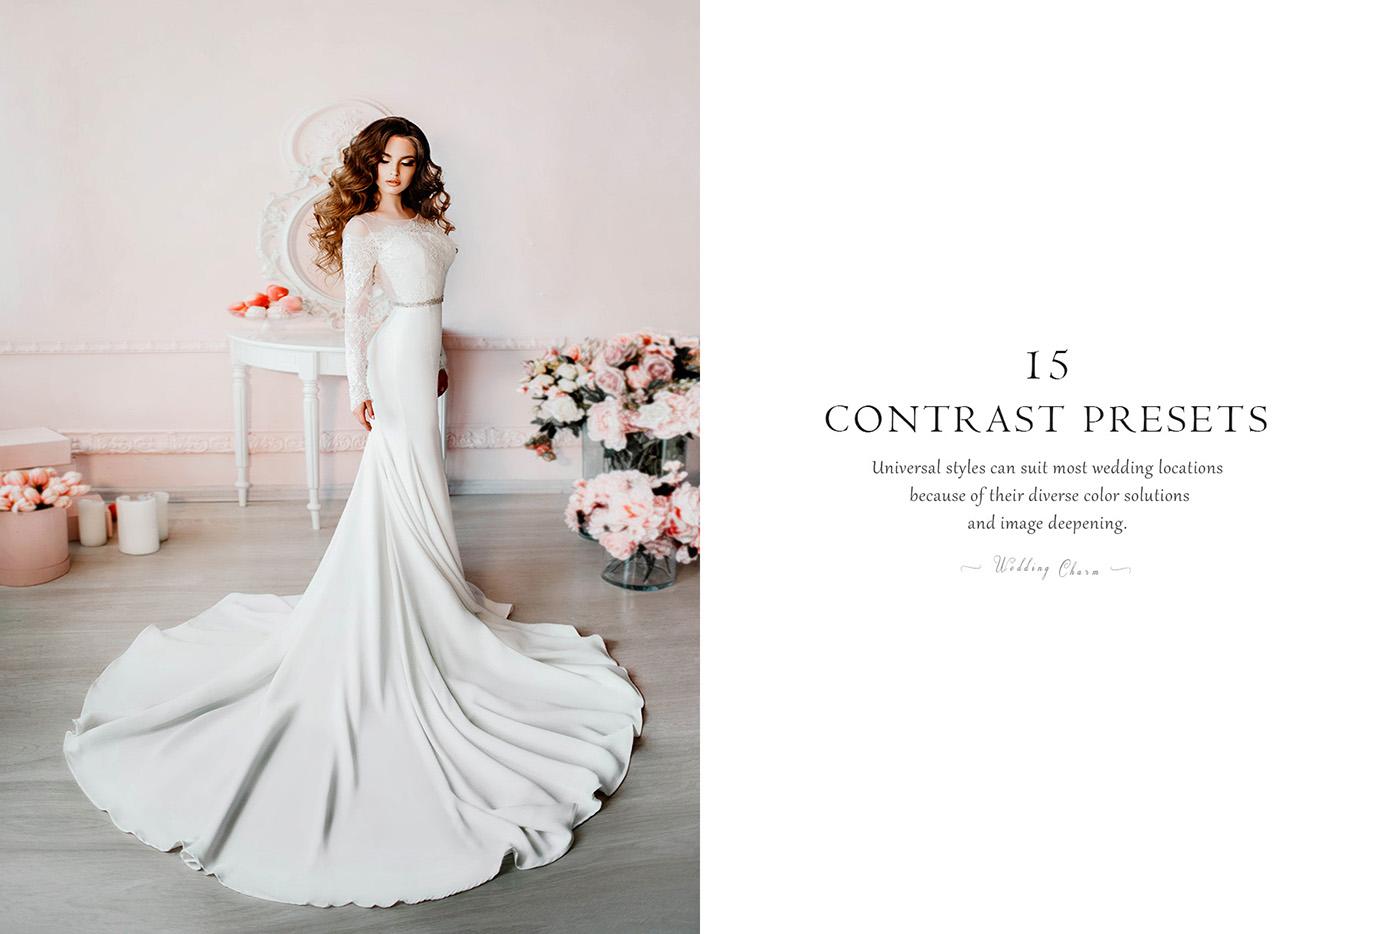 lightroom wedding presets common info table Contrast Presets